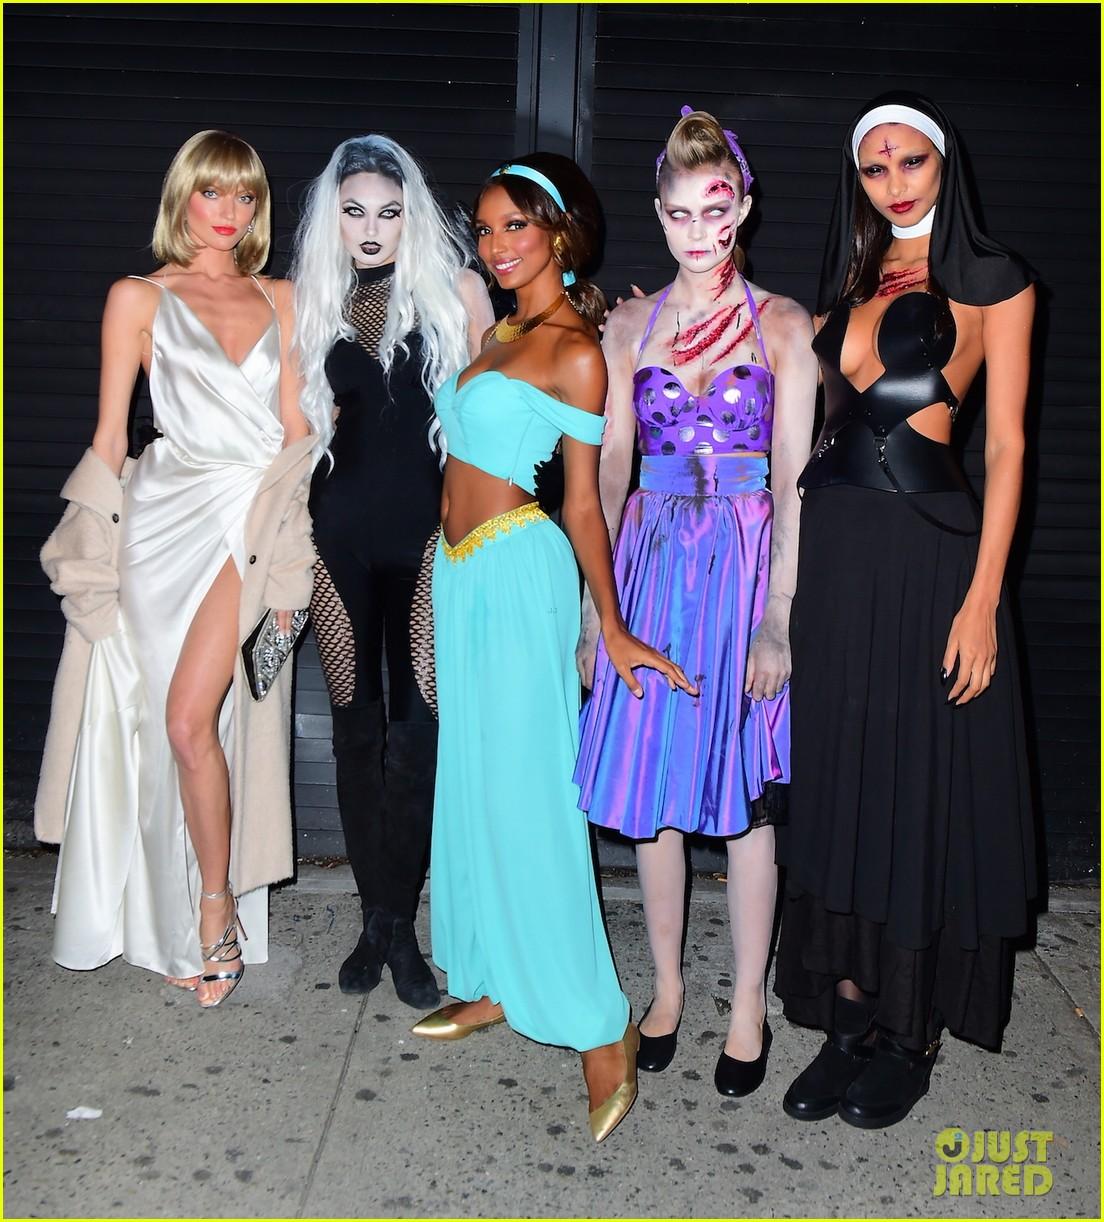 Victoria\'s Secret Angels Dress Up for Halloween Weekend 2016!: Photo ...